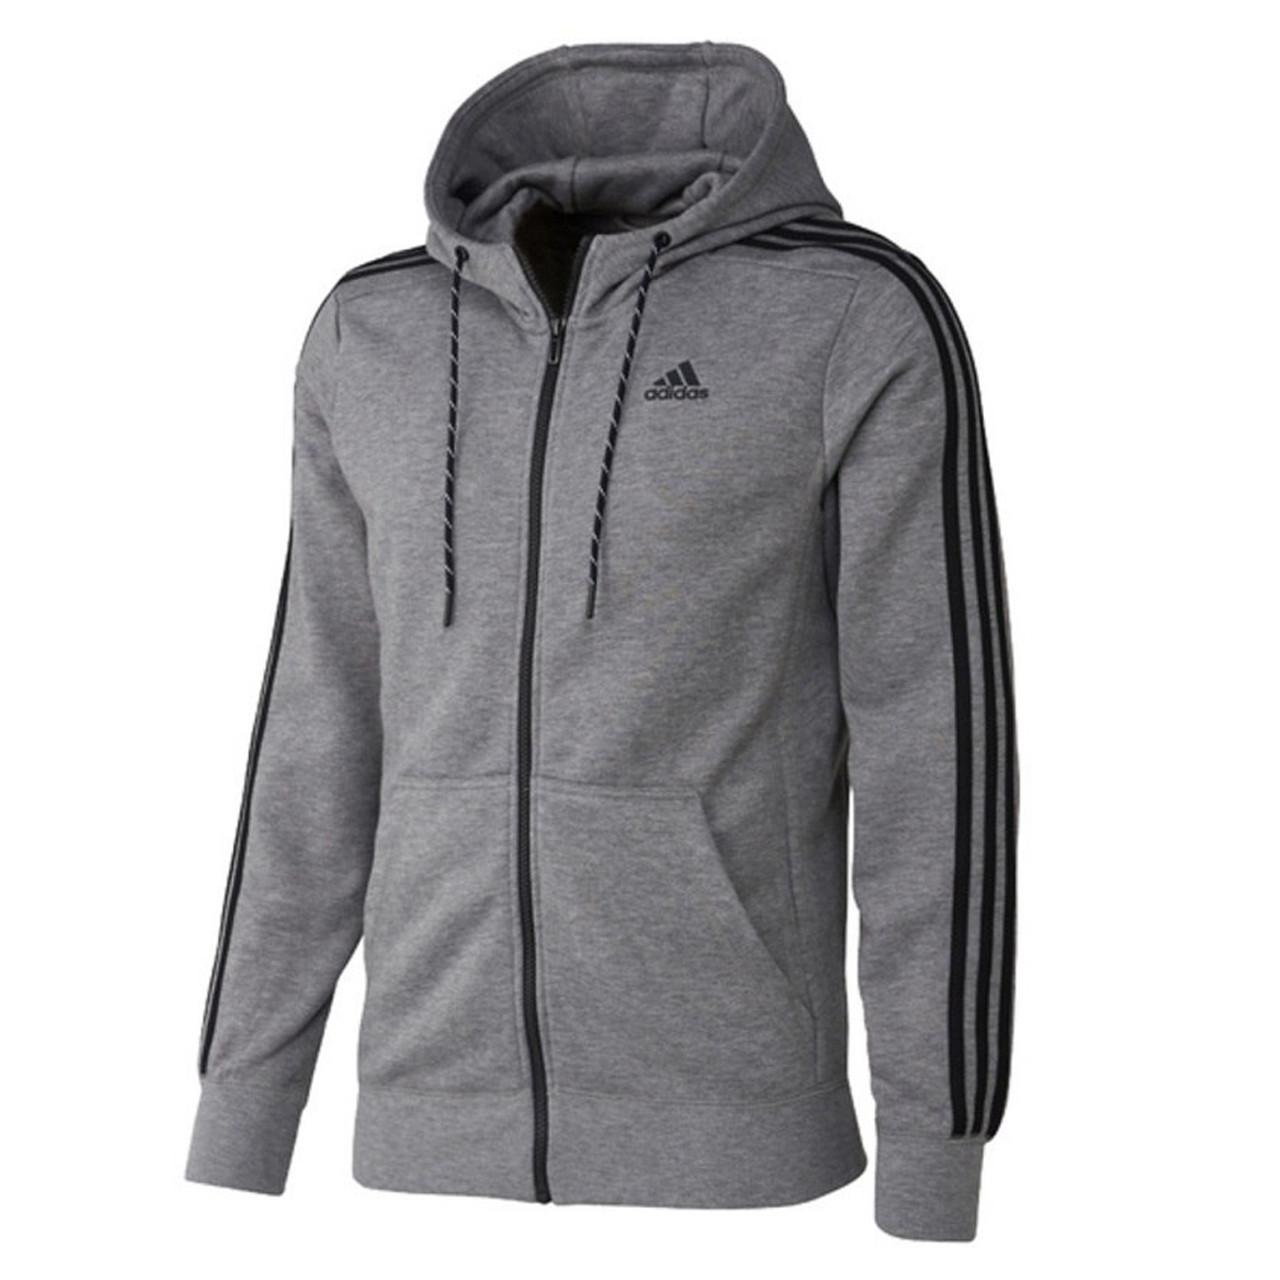 Adidas Essentials 3 Stripe FZ Hoodie S17875 Grey, Black